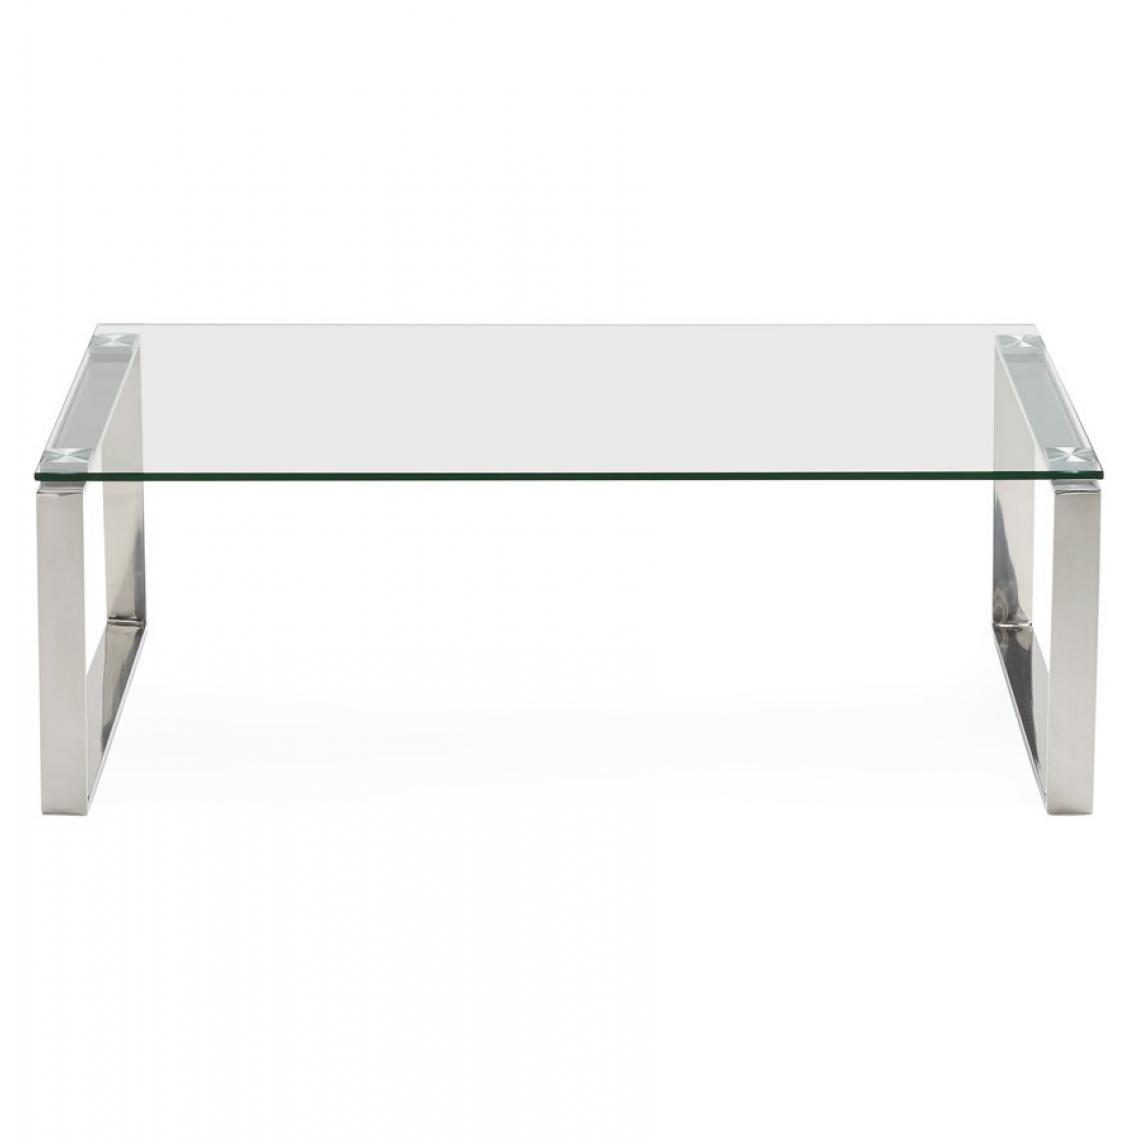 table basse en verre transparent wisconsin